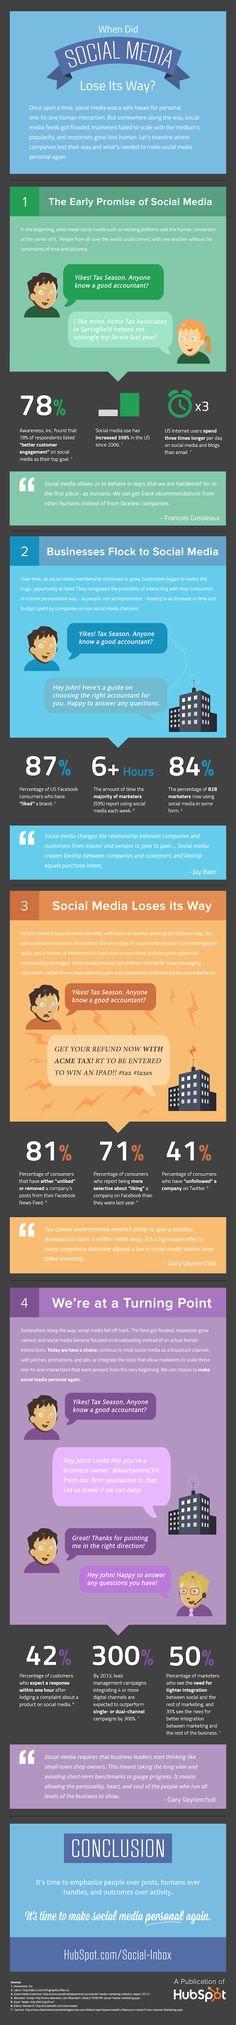 [Infographic] Wat ging er mis met social media? » Door: Karin Oenema -